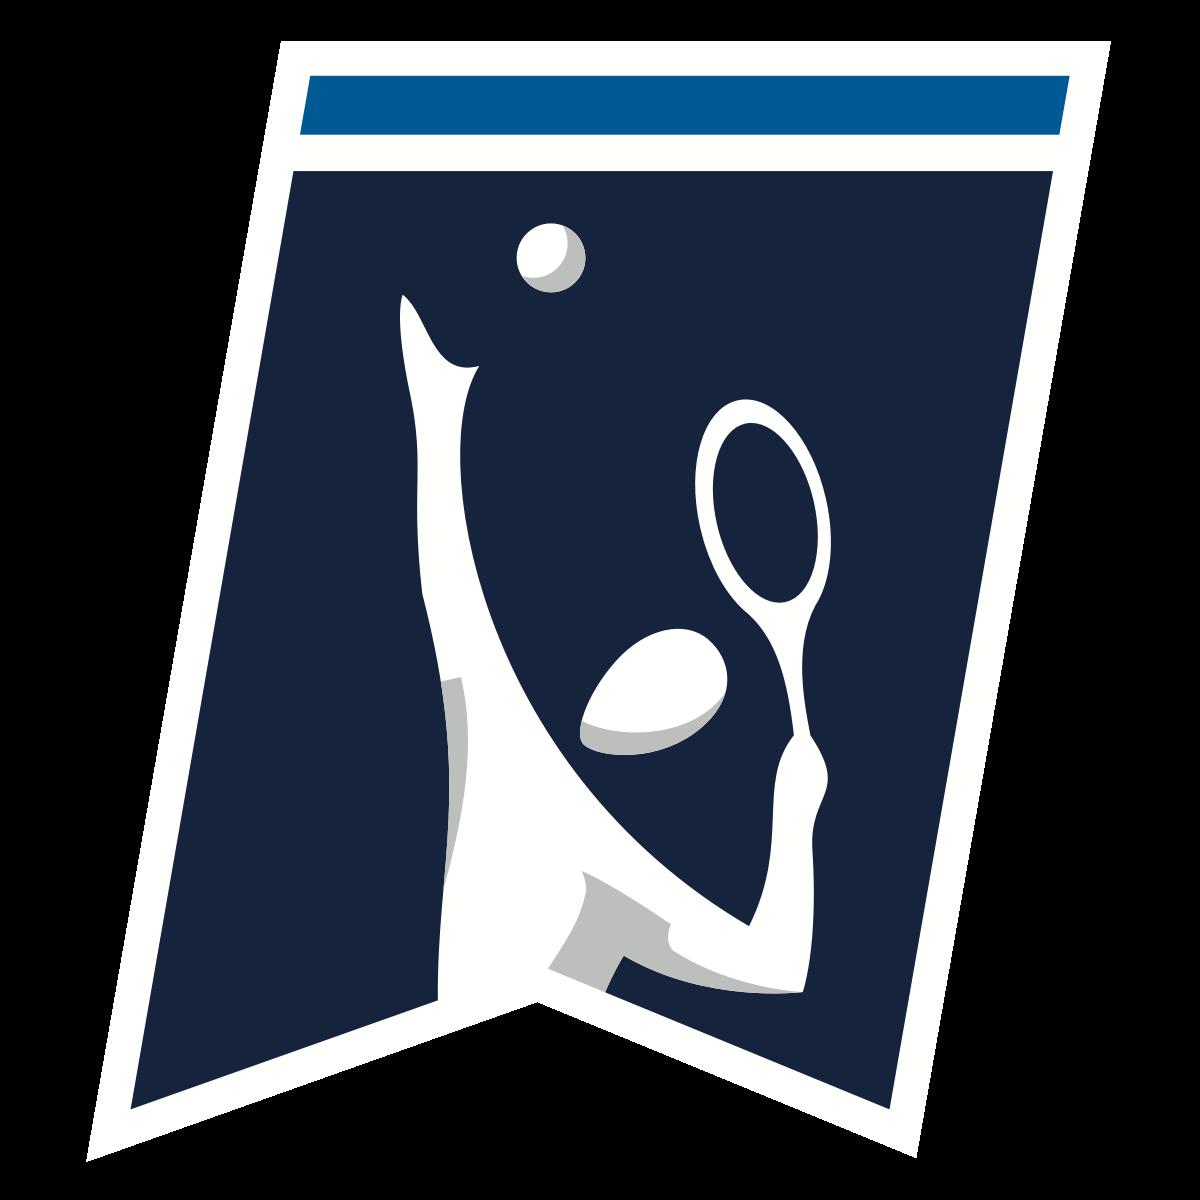 2018 DIII Women's Tennis Championship